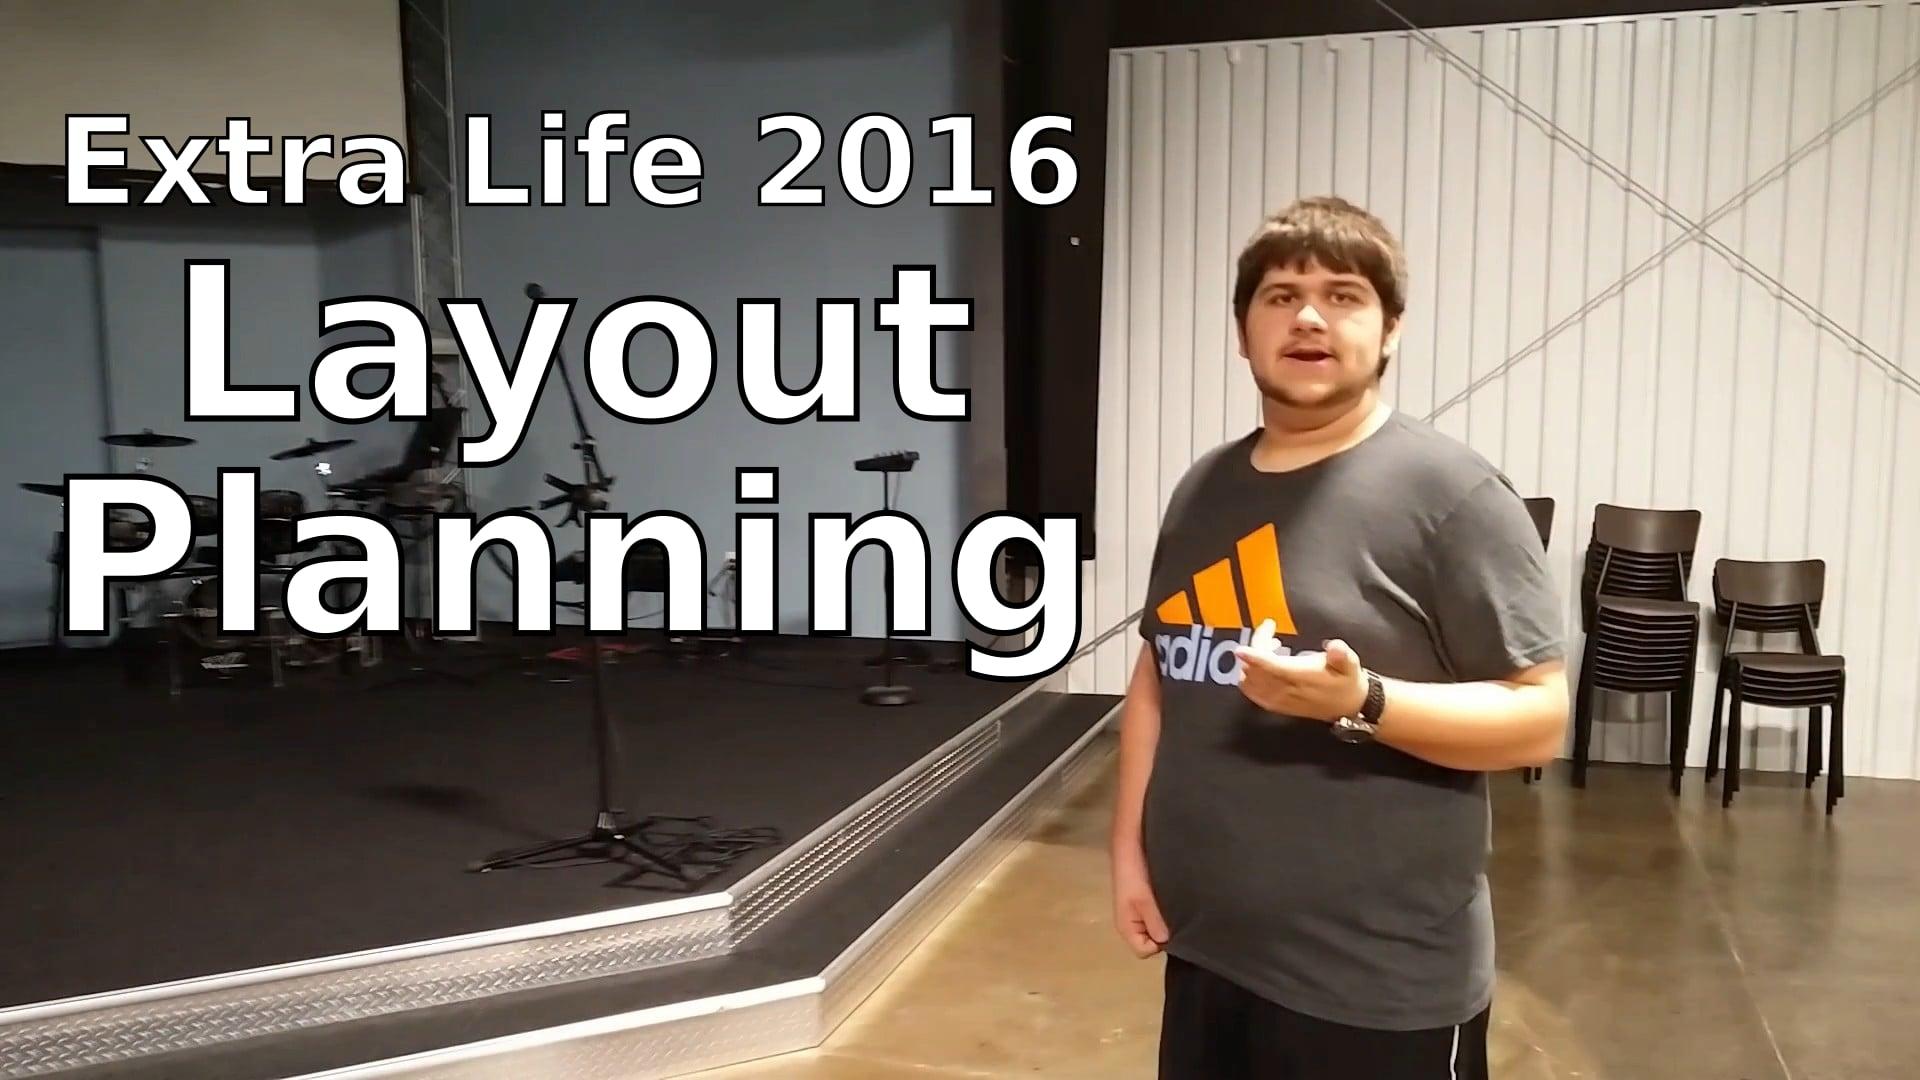 Layout Planning - Extra Life 2016 BTS